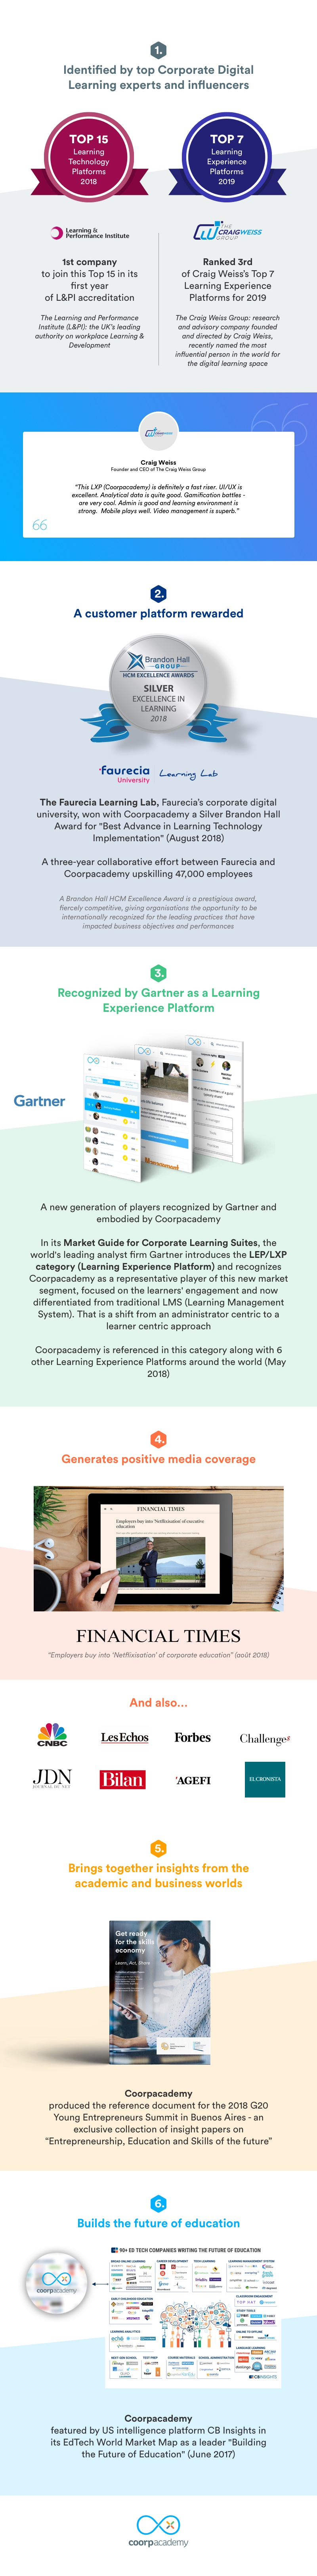 Coorpacademy Infographics